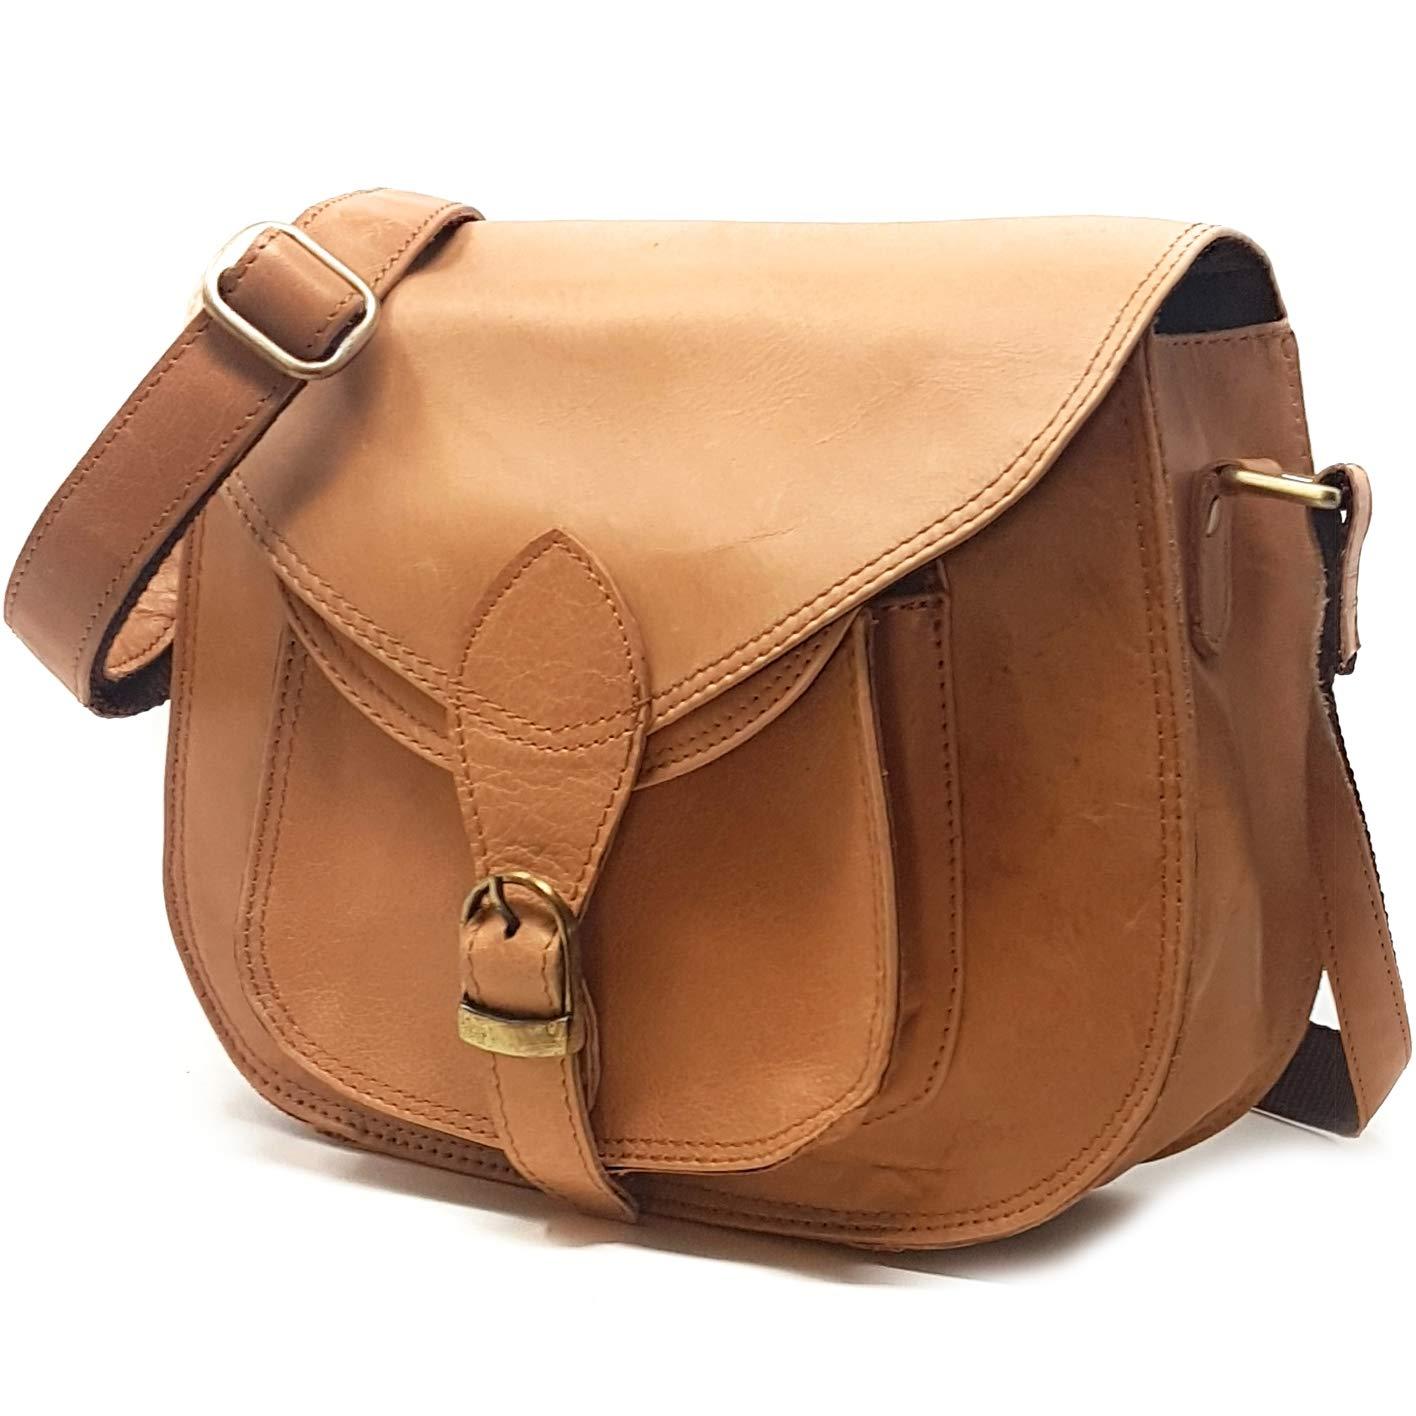 3ea8d99fe7f3 Vintage Leather Handbag and Purse for Women - Ladies Leather Crossbody  Shoulder Messenger Satchel Bag  Handbags  Amazon.com